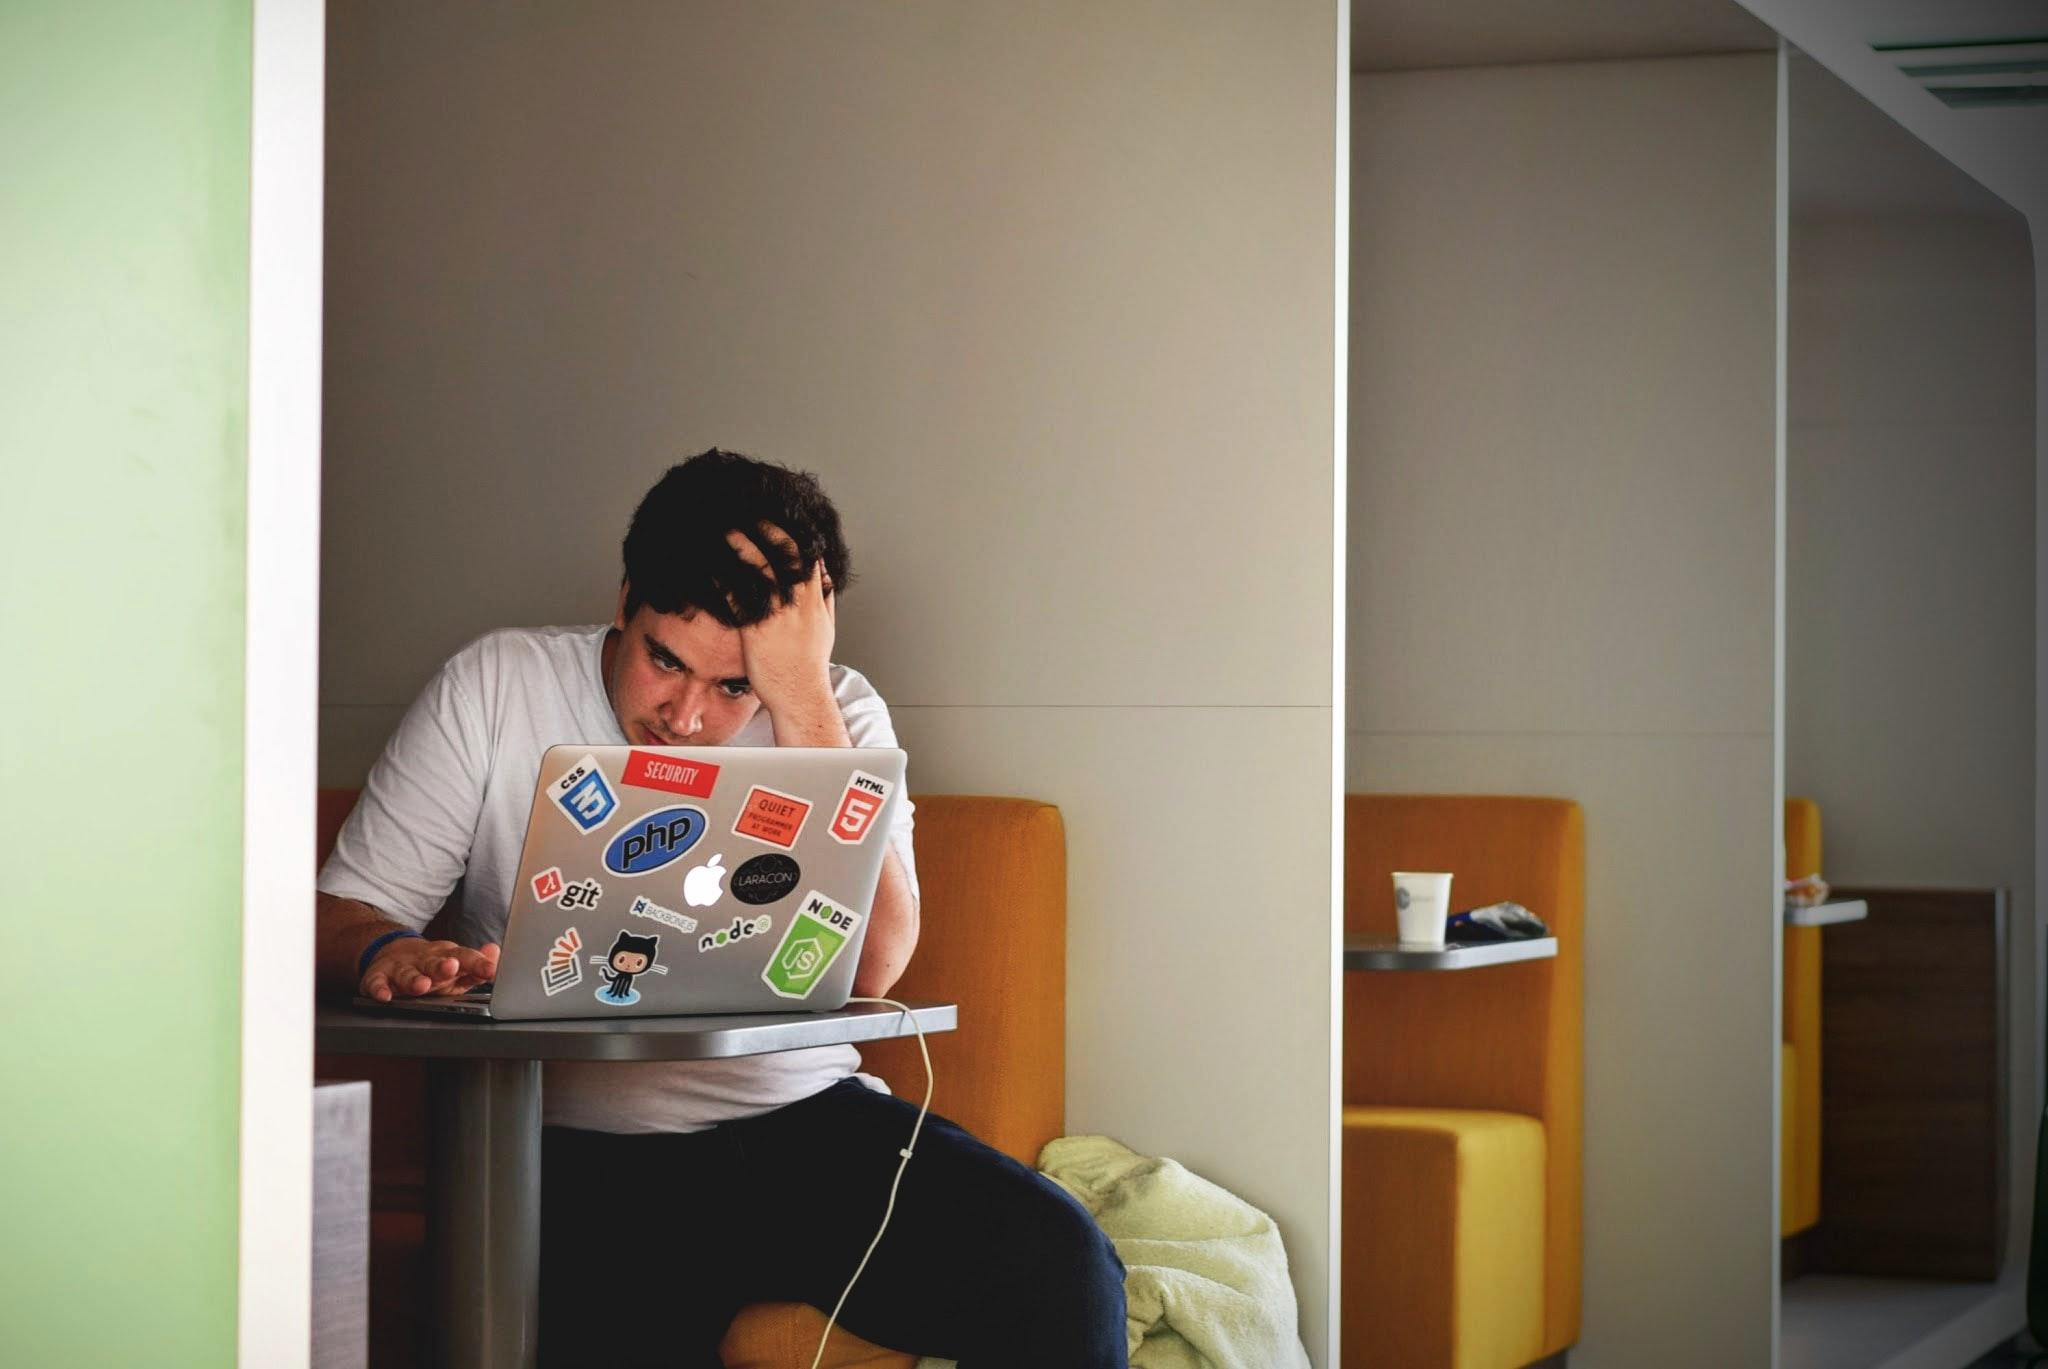 Explaining online proofing is not always easy